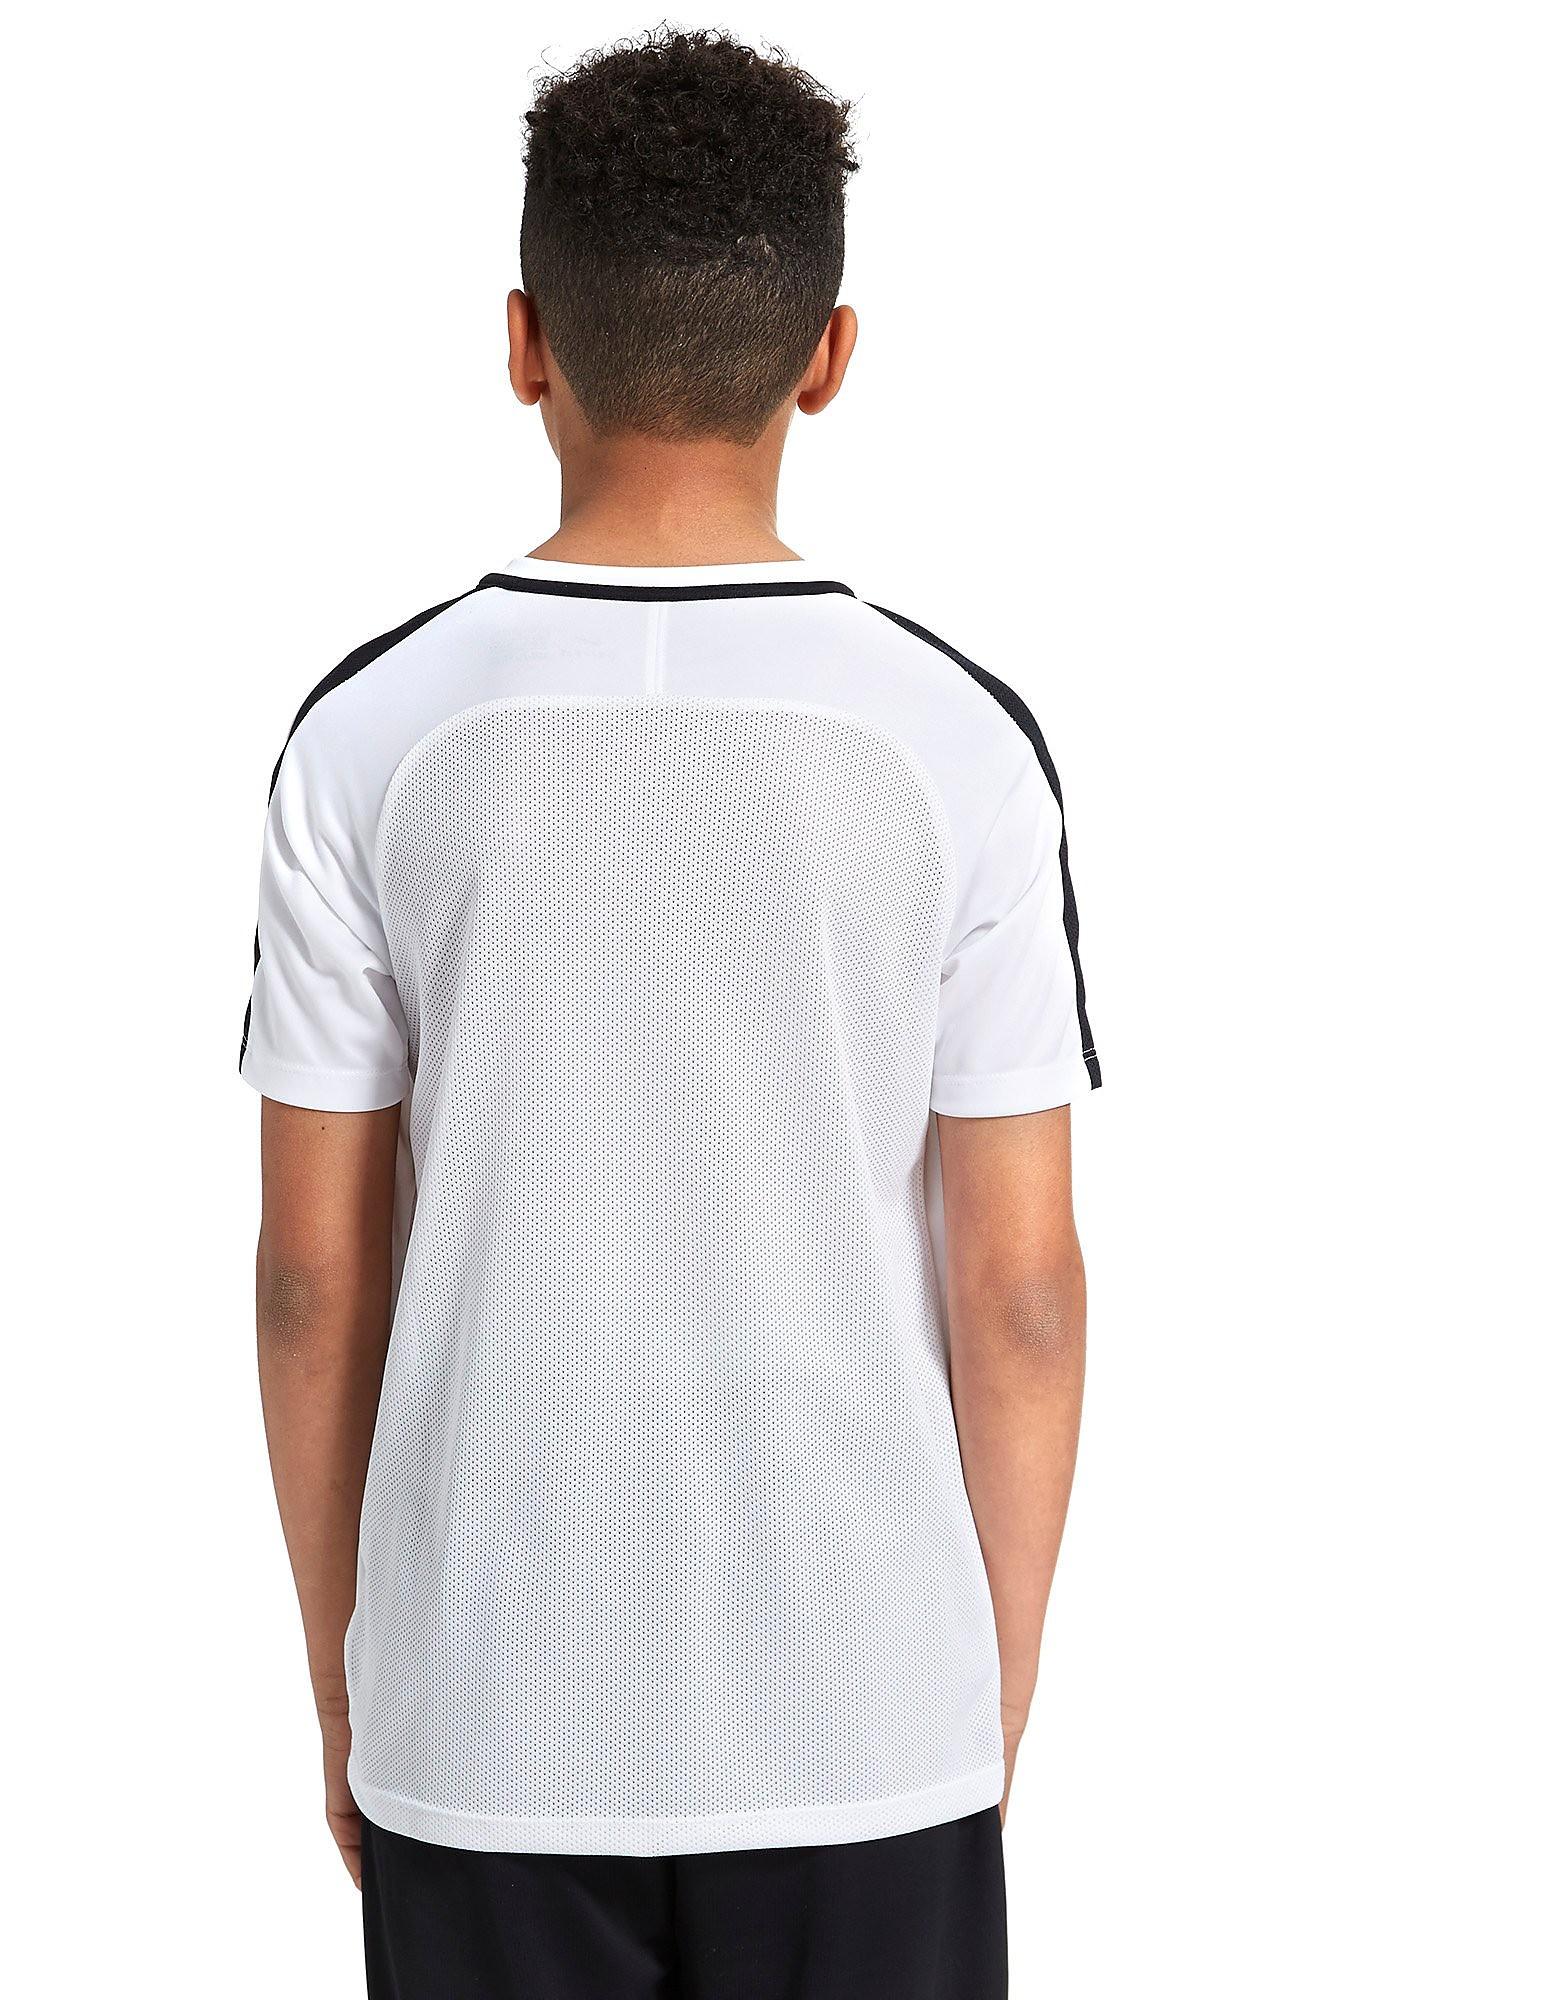 Nike camiseta Academy Poly júnior